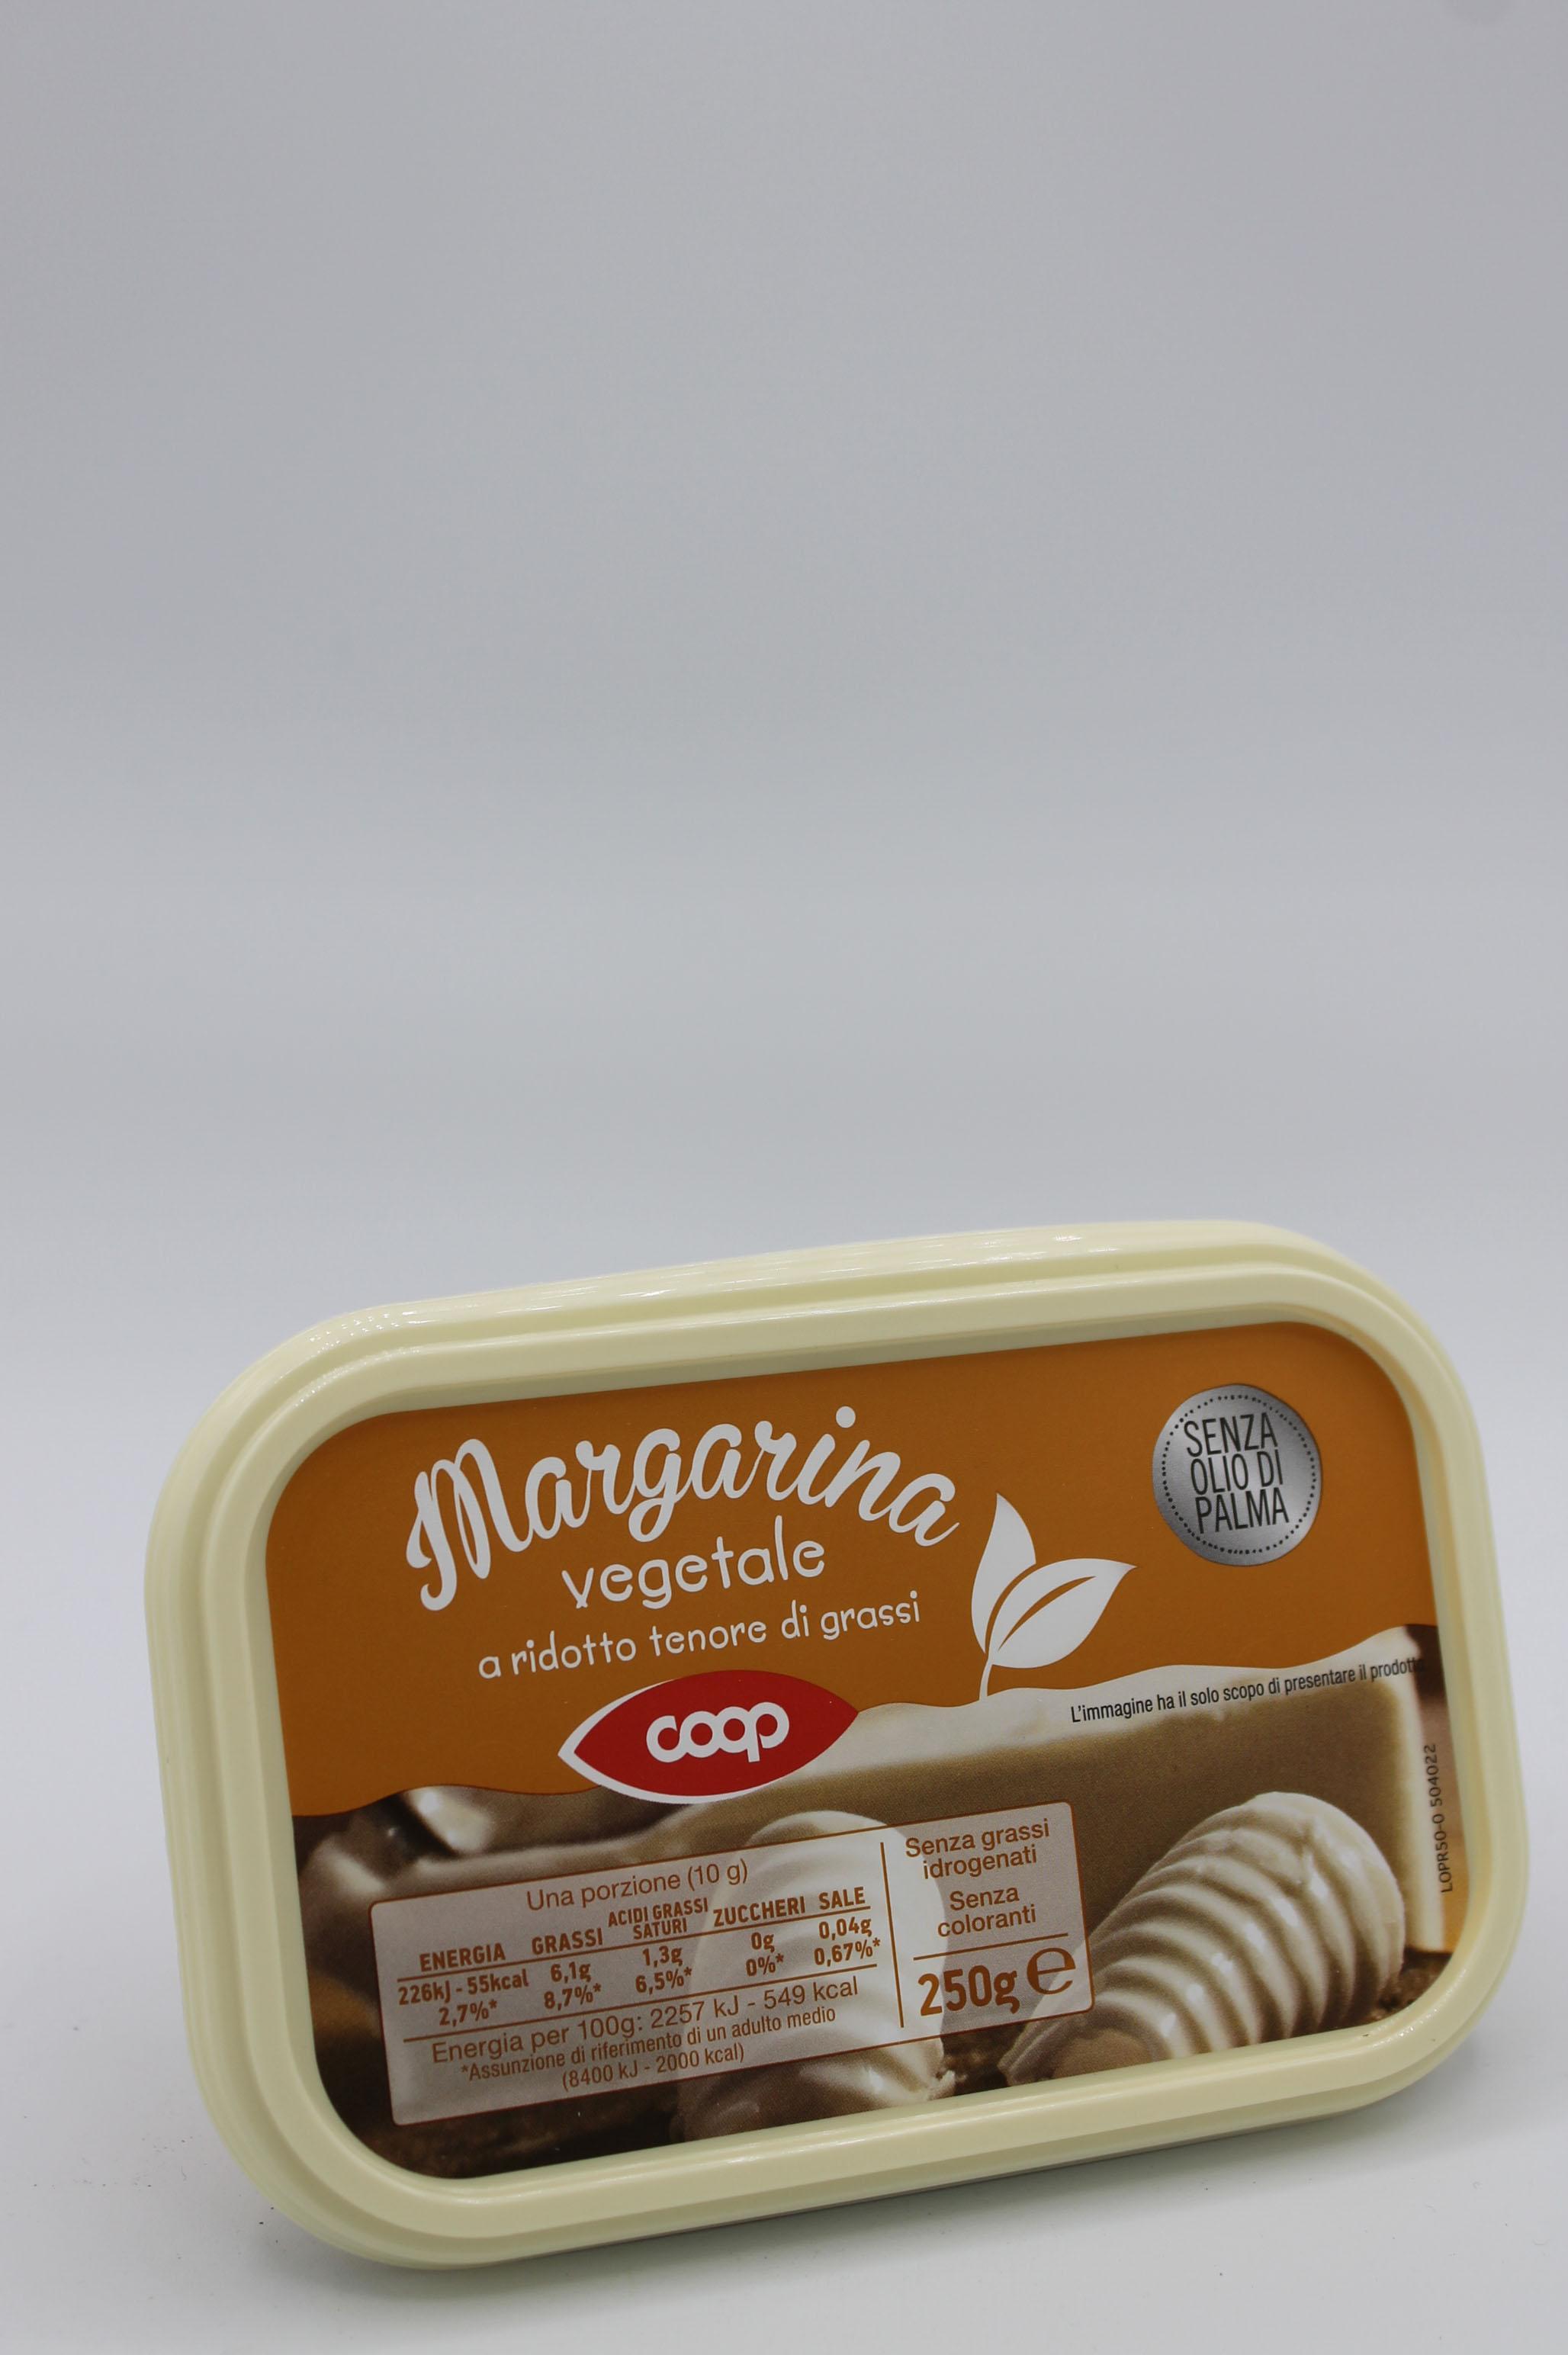 Coop margarina vegetale 250gr.